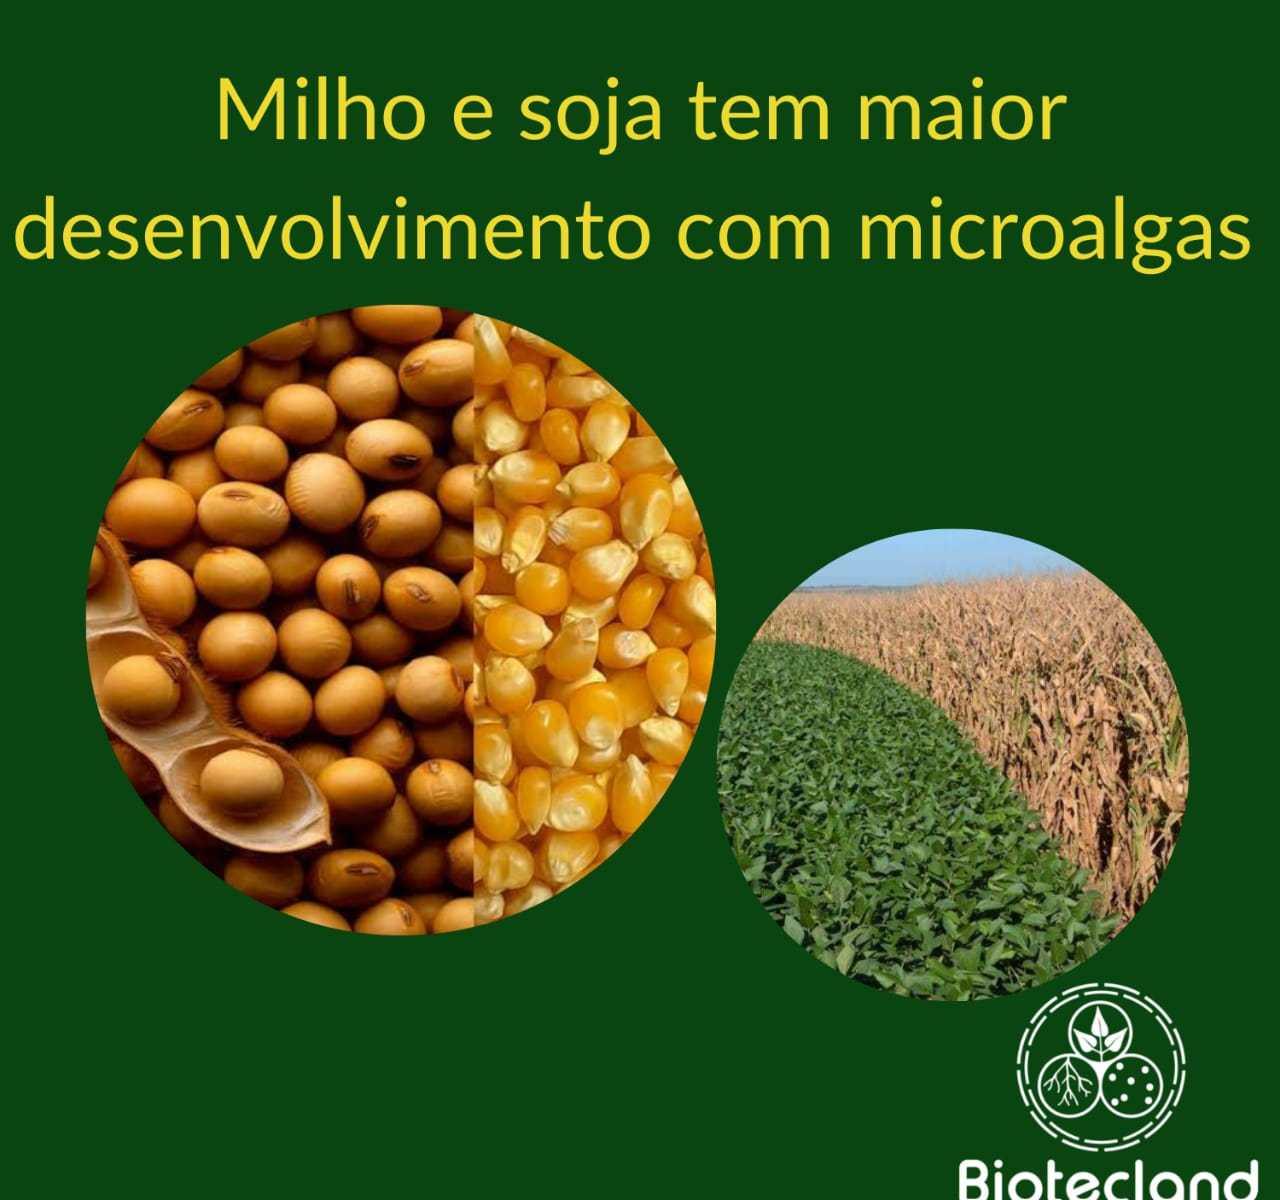 Milho, Soja e Algas